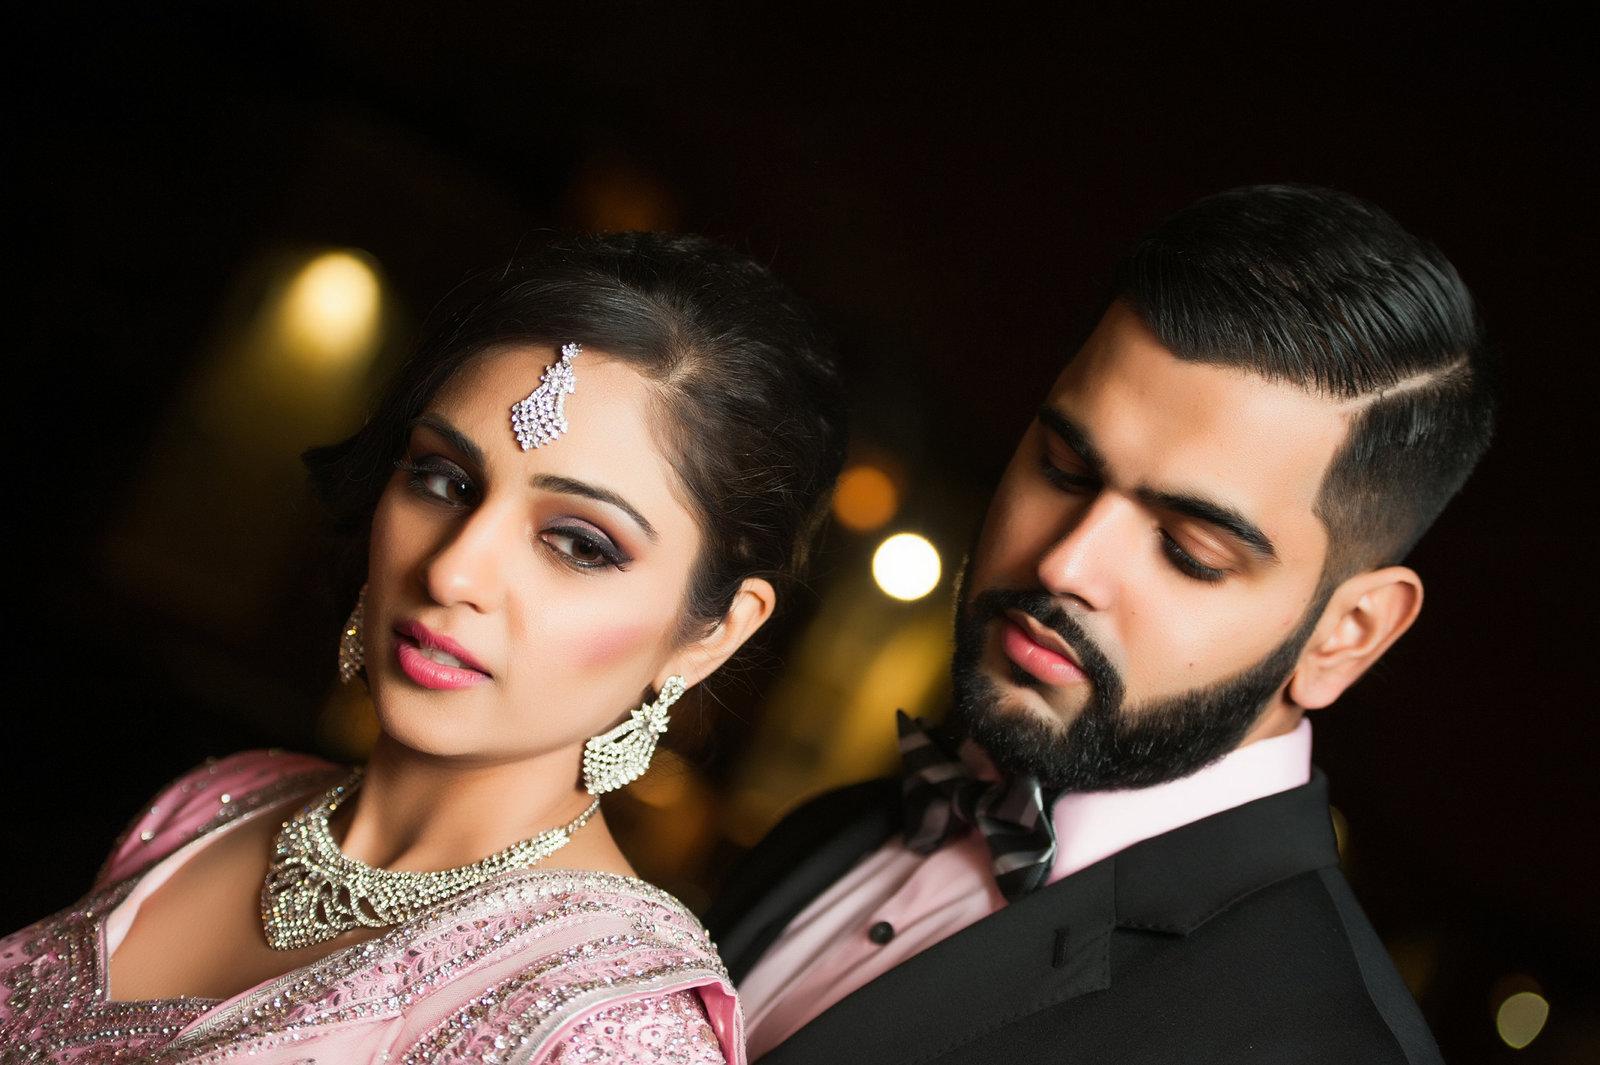 kc-professional-wedding-photographers-0001